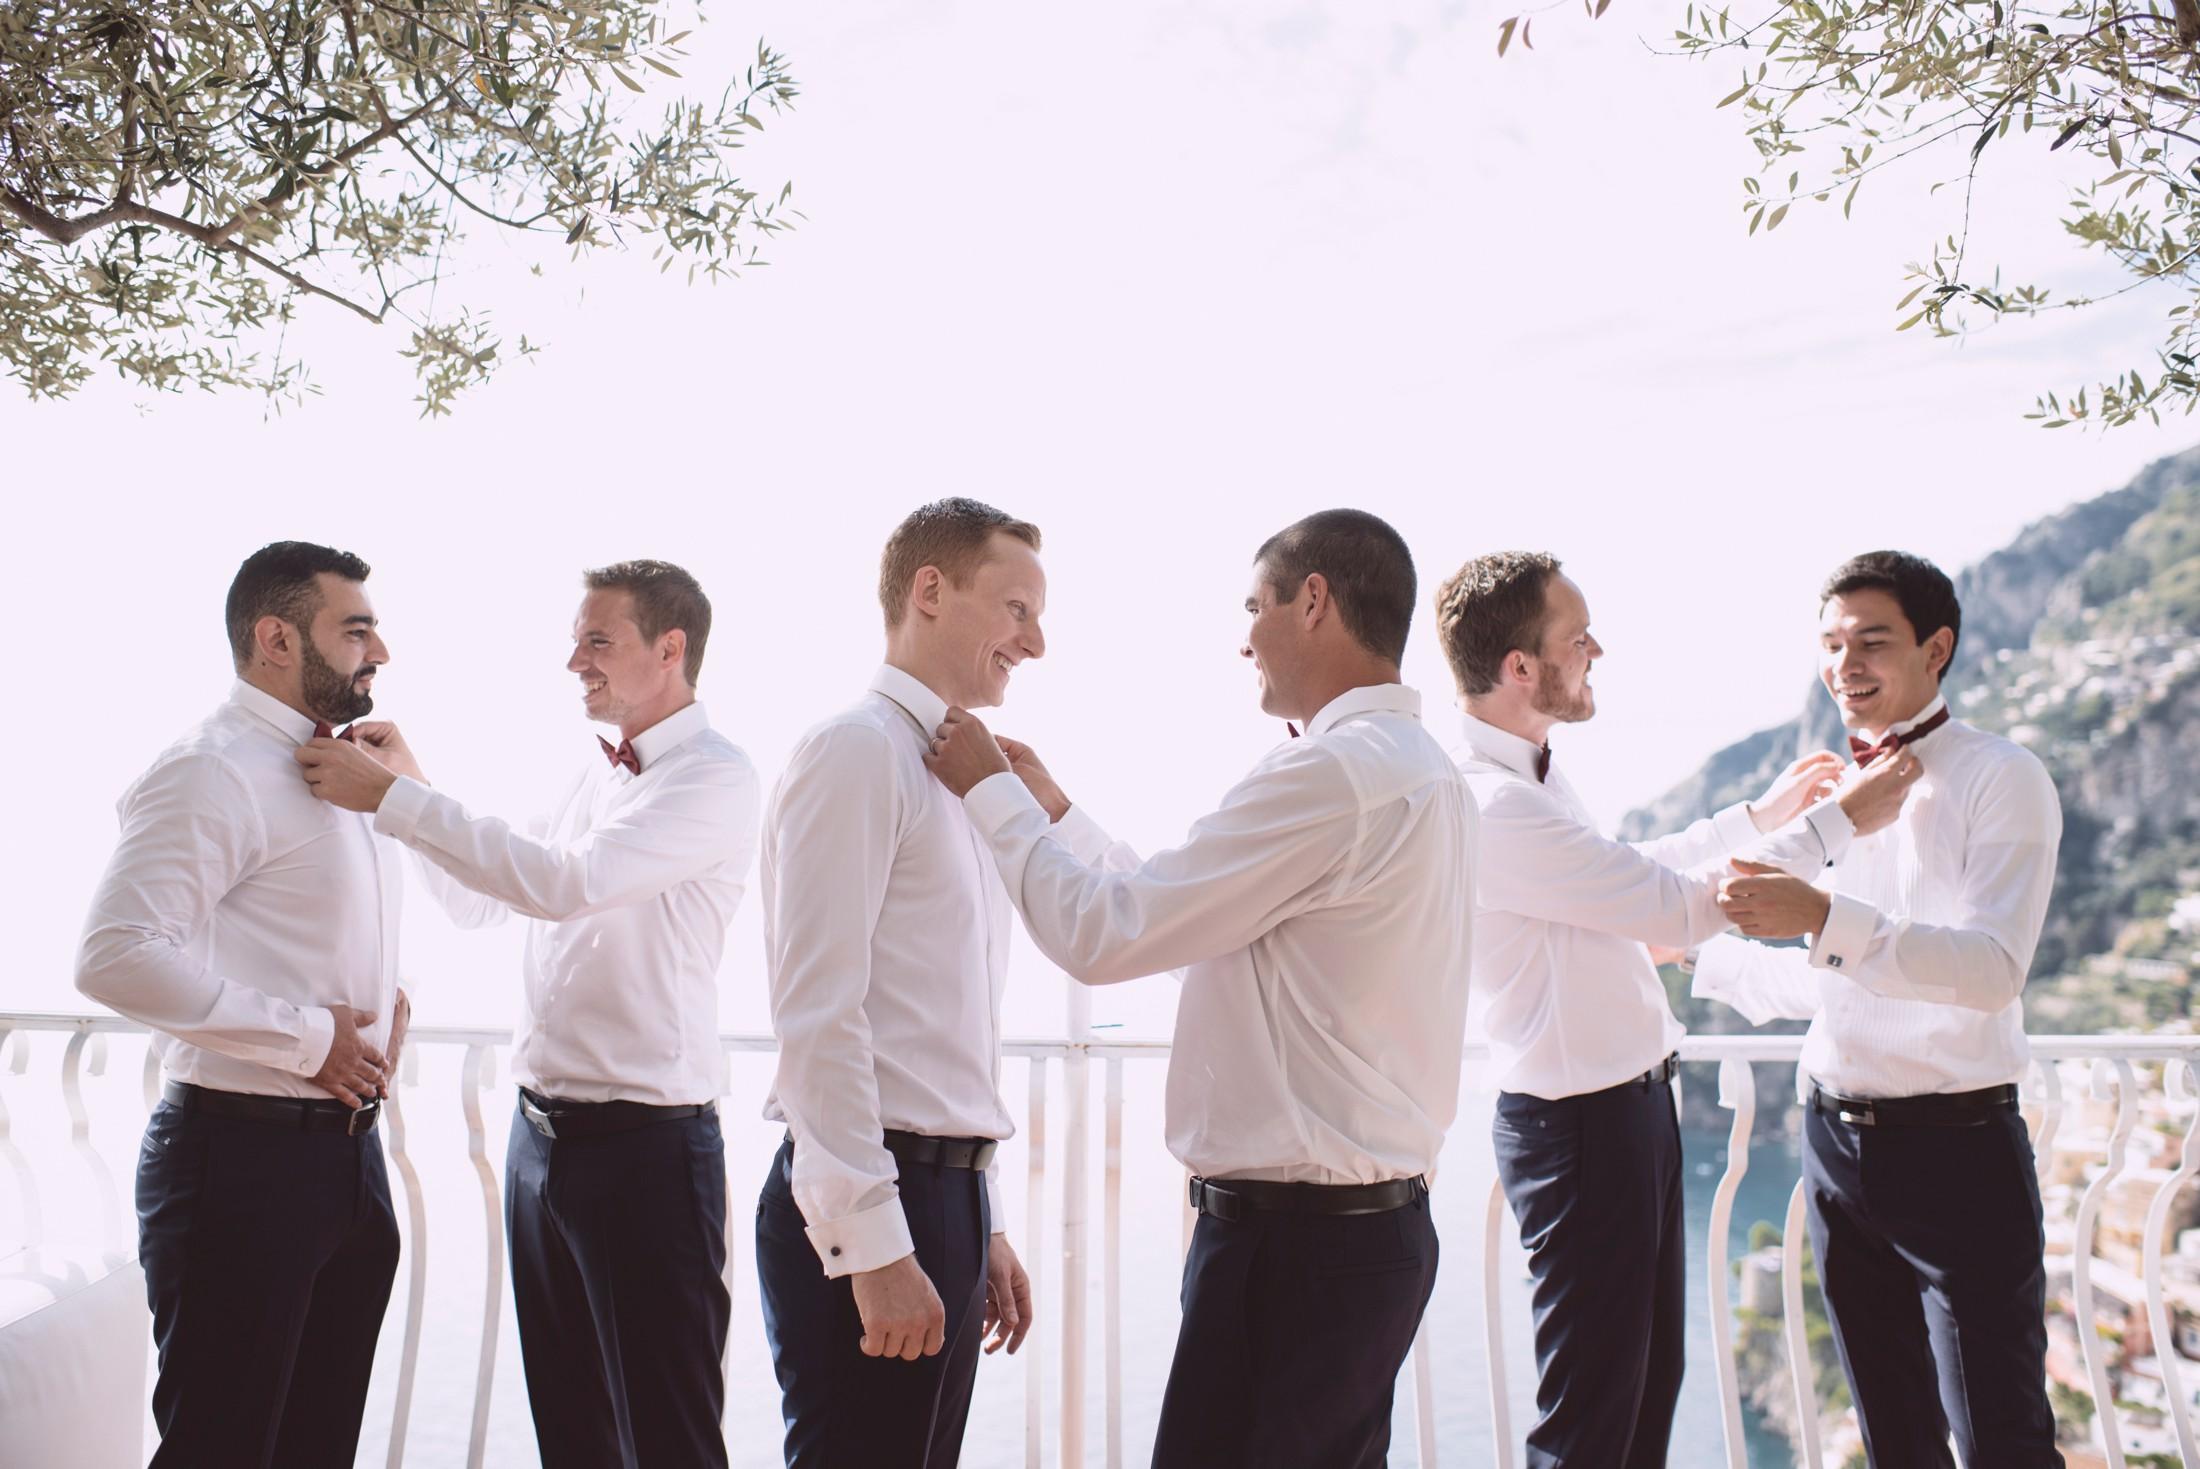 positano wedding groom and best men getting ready on the balcony